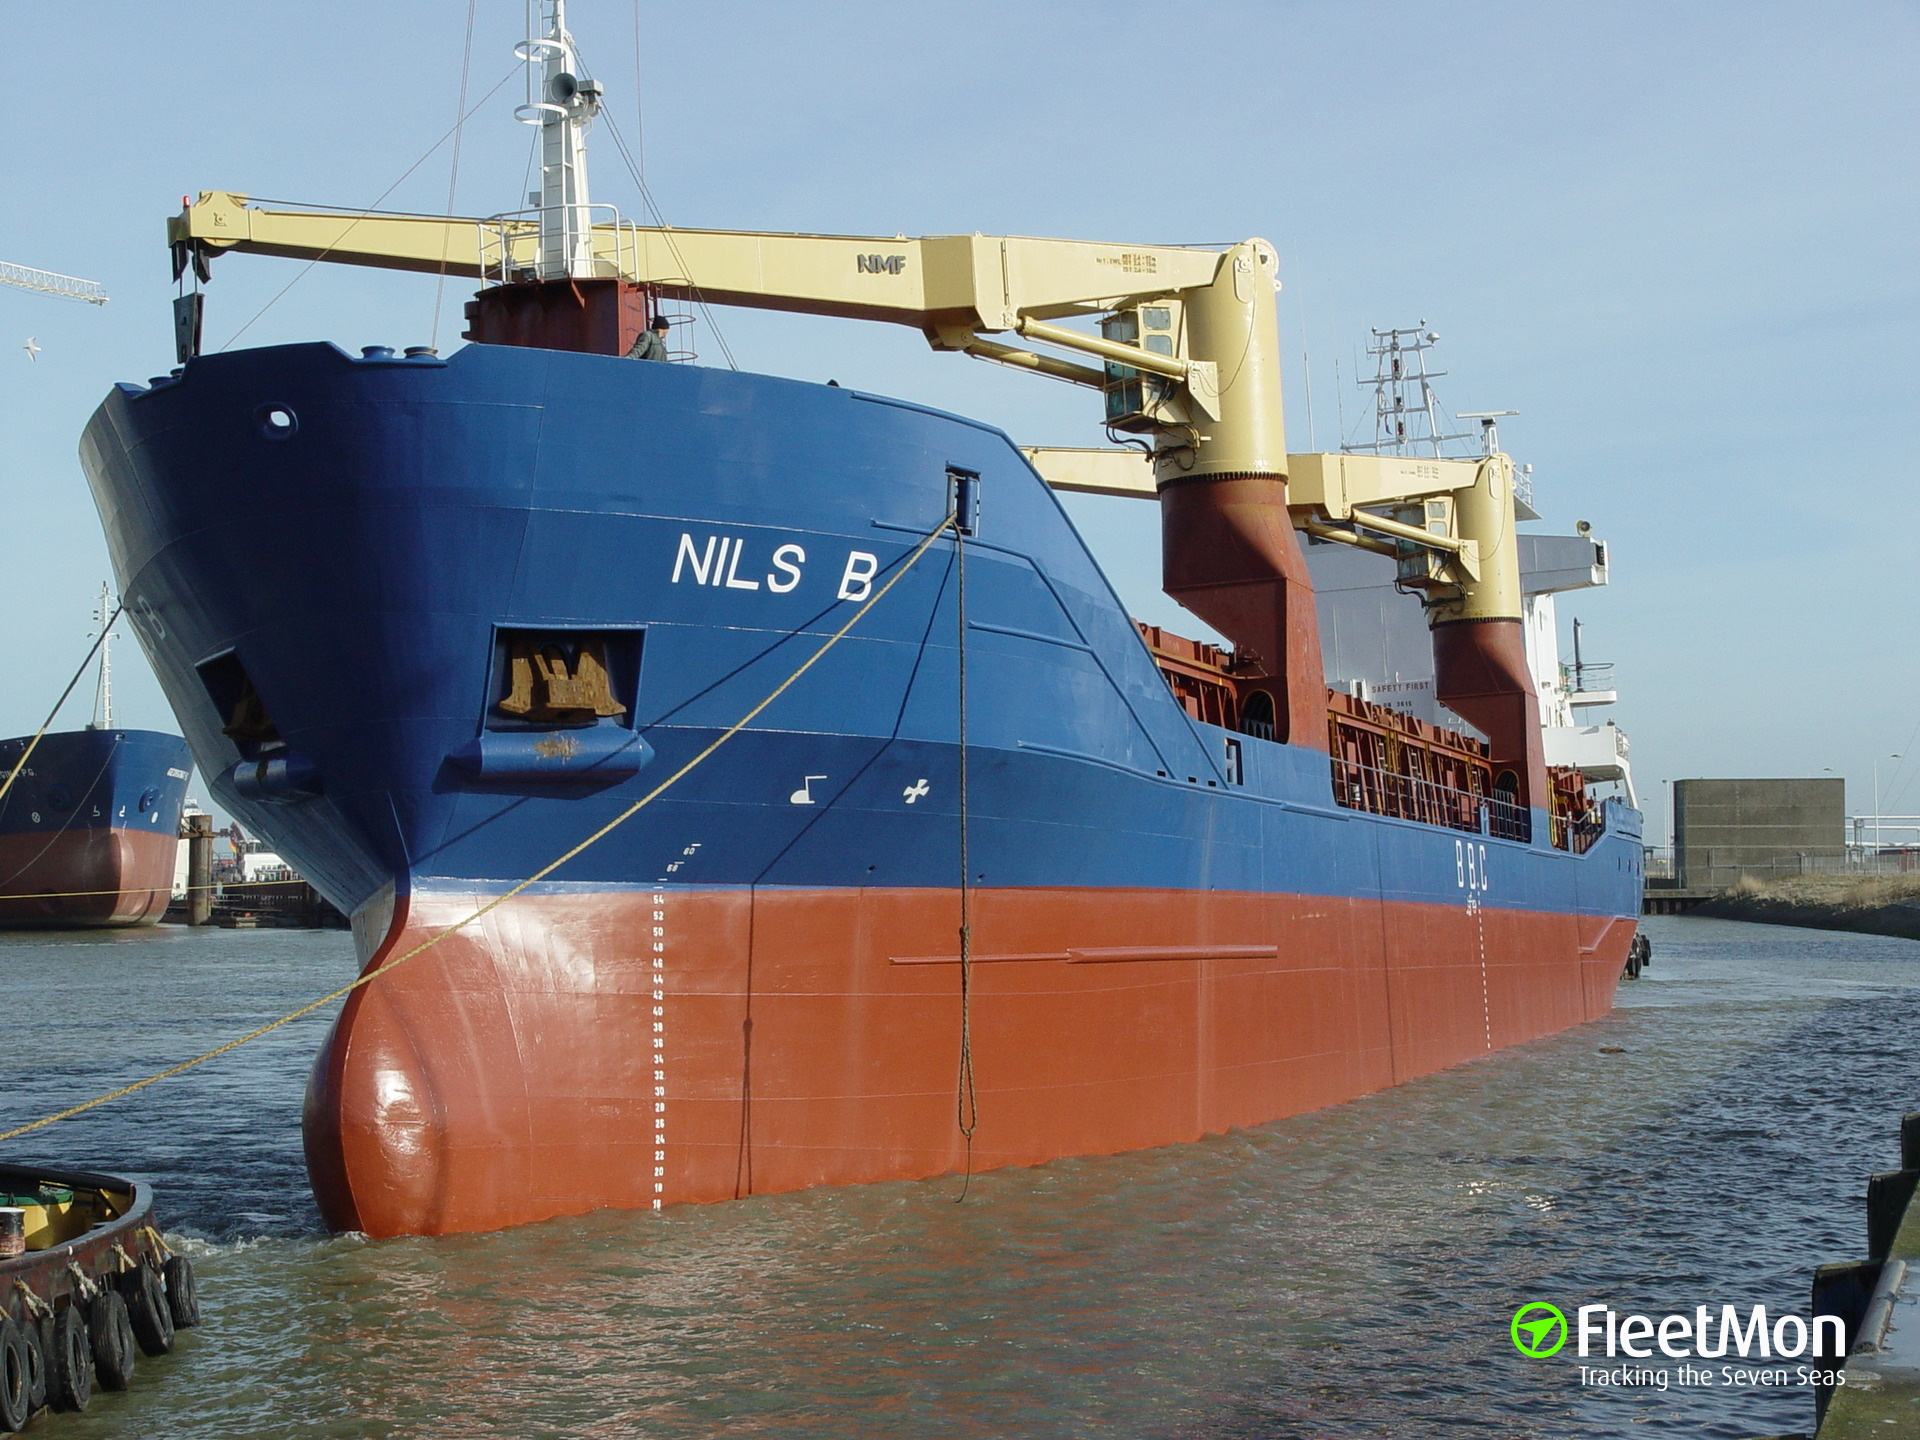 MERIDIAN TRES sank, 1 crew missing, Philippines